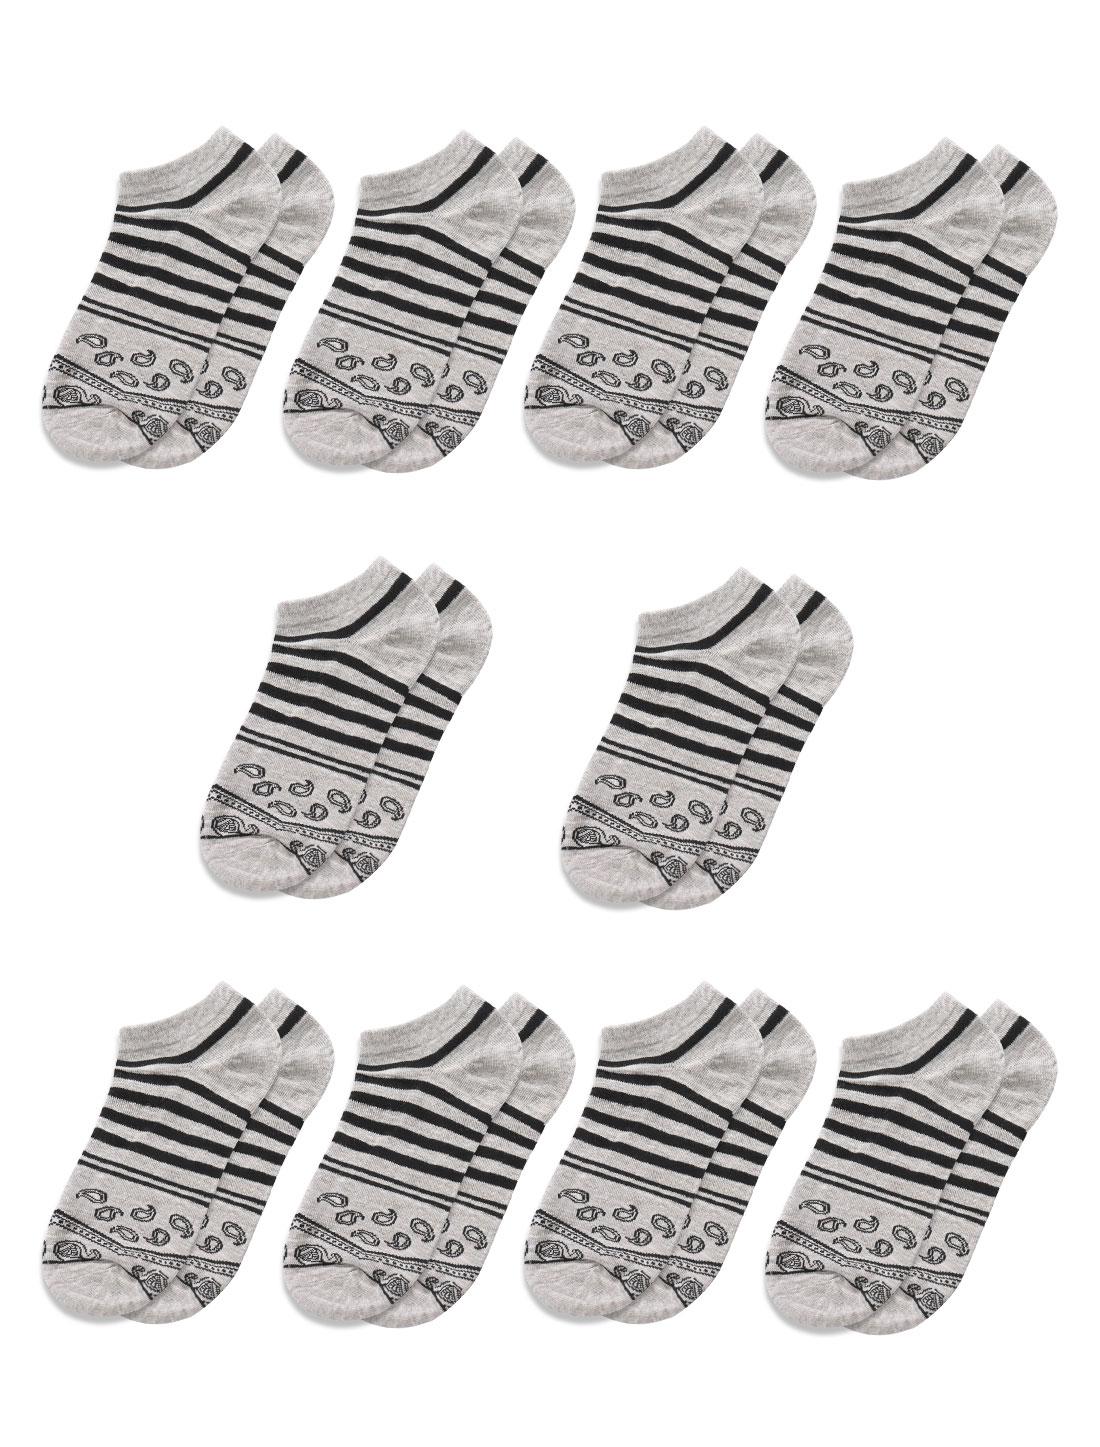 Men Stripes Paisleys Pattern Low Cut Short Socks 10 Pairs Gray M